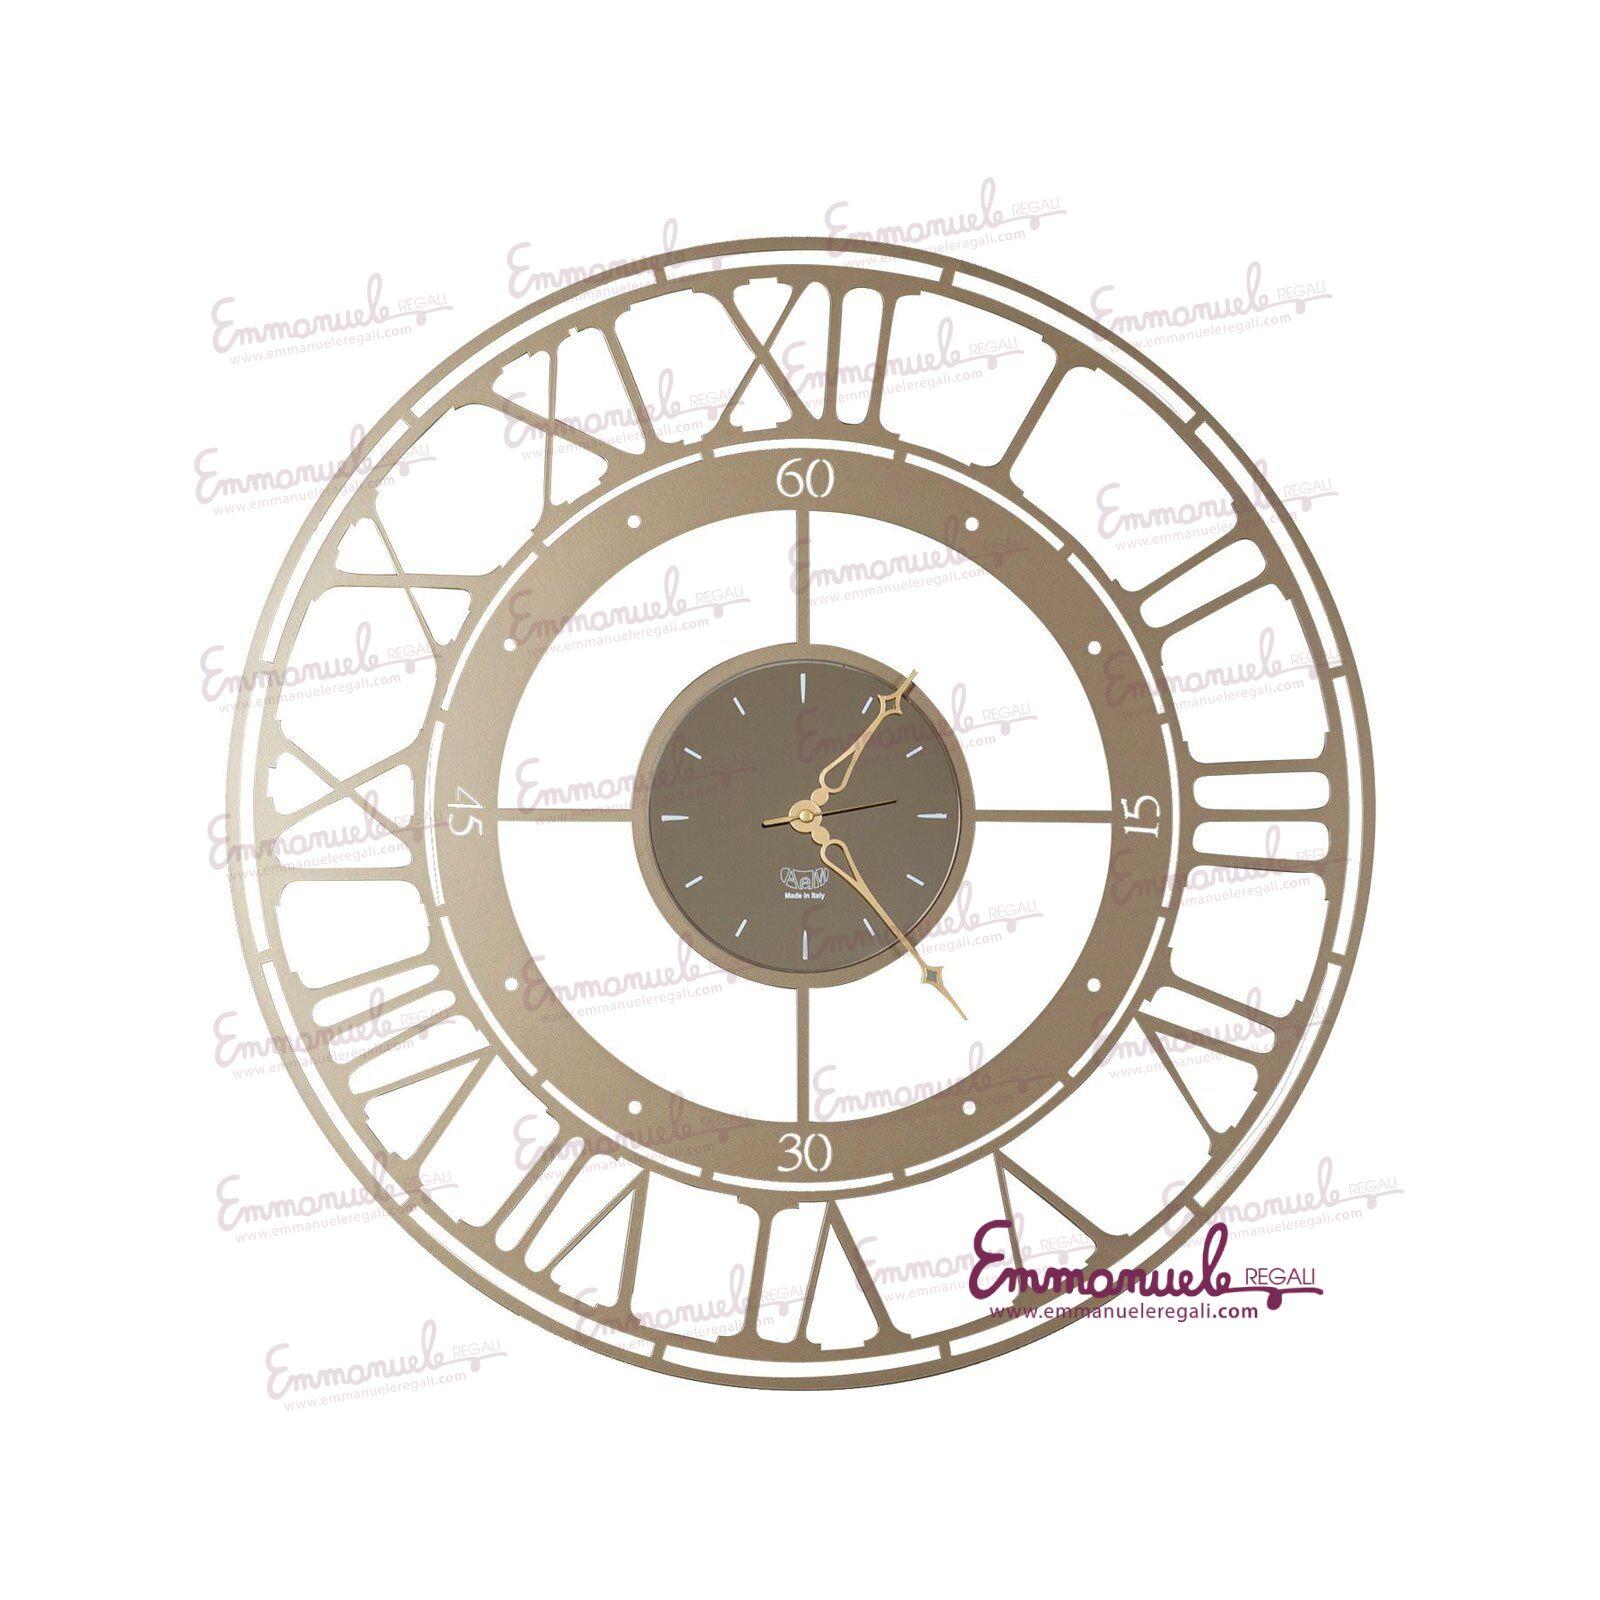 0OR3108C20-Orologio da perete Koros-Arti e Mestieri-emmanueleregali-bombonieraperfetta